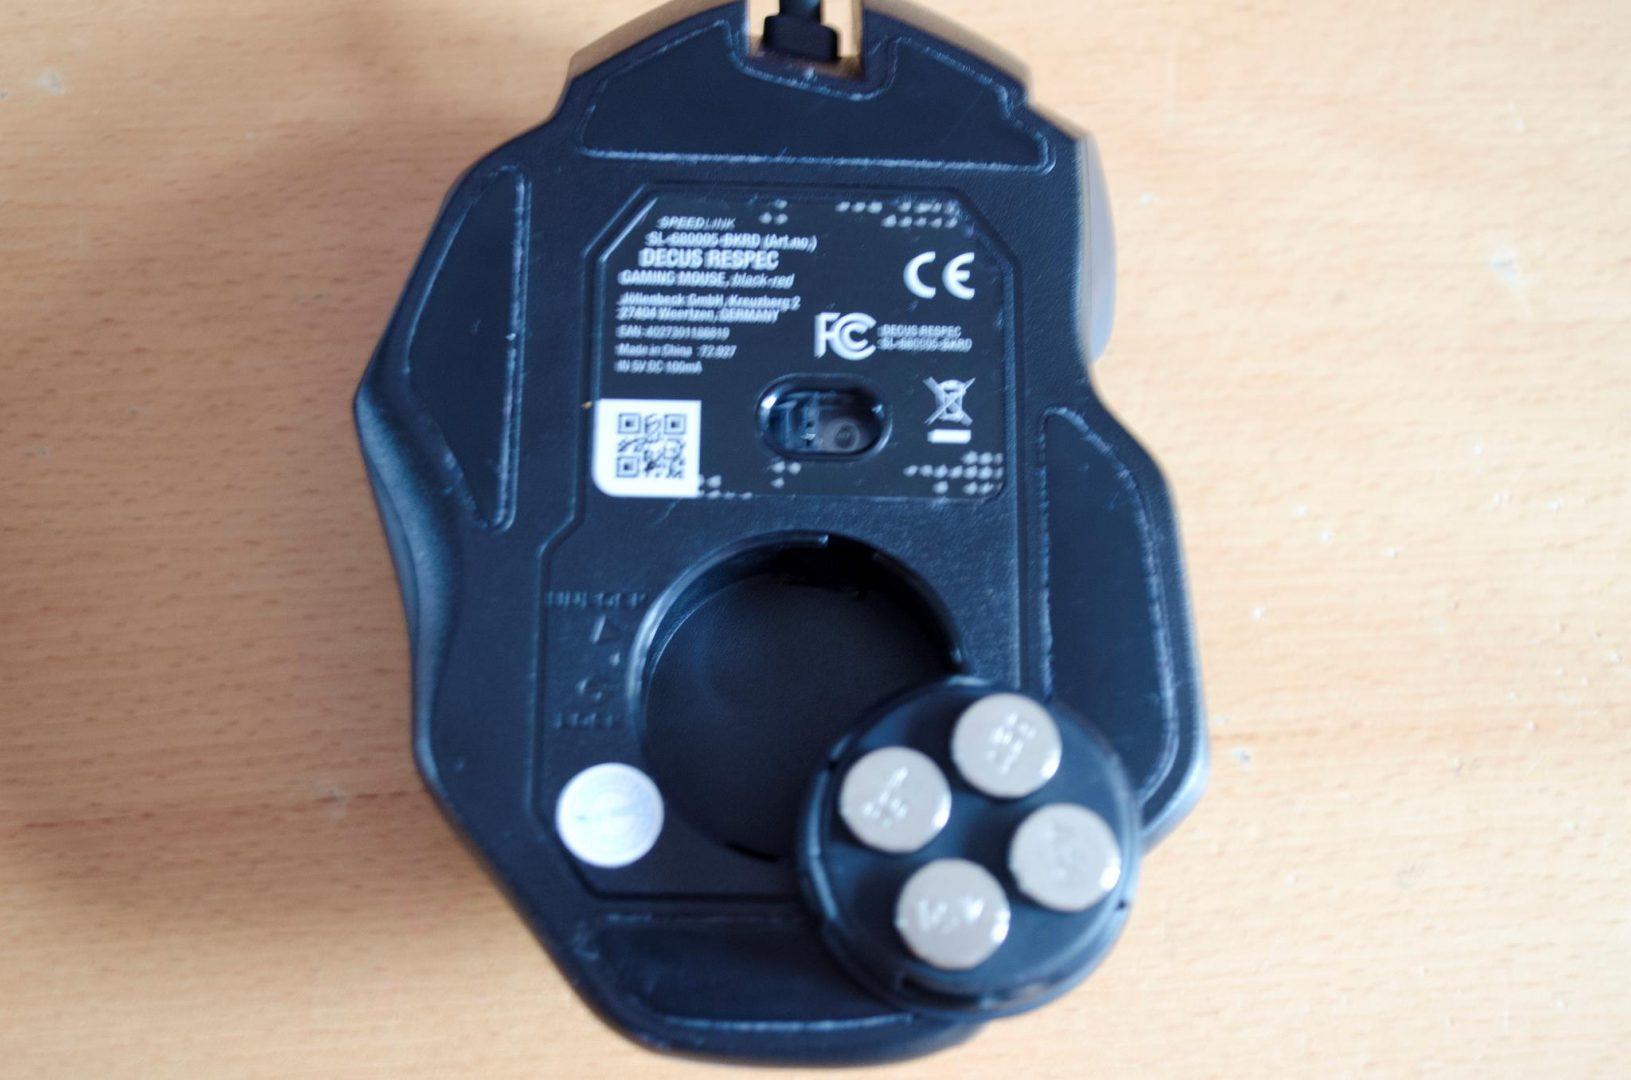 speedlink decus respec gaming mouse review_8